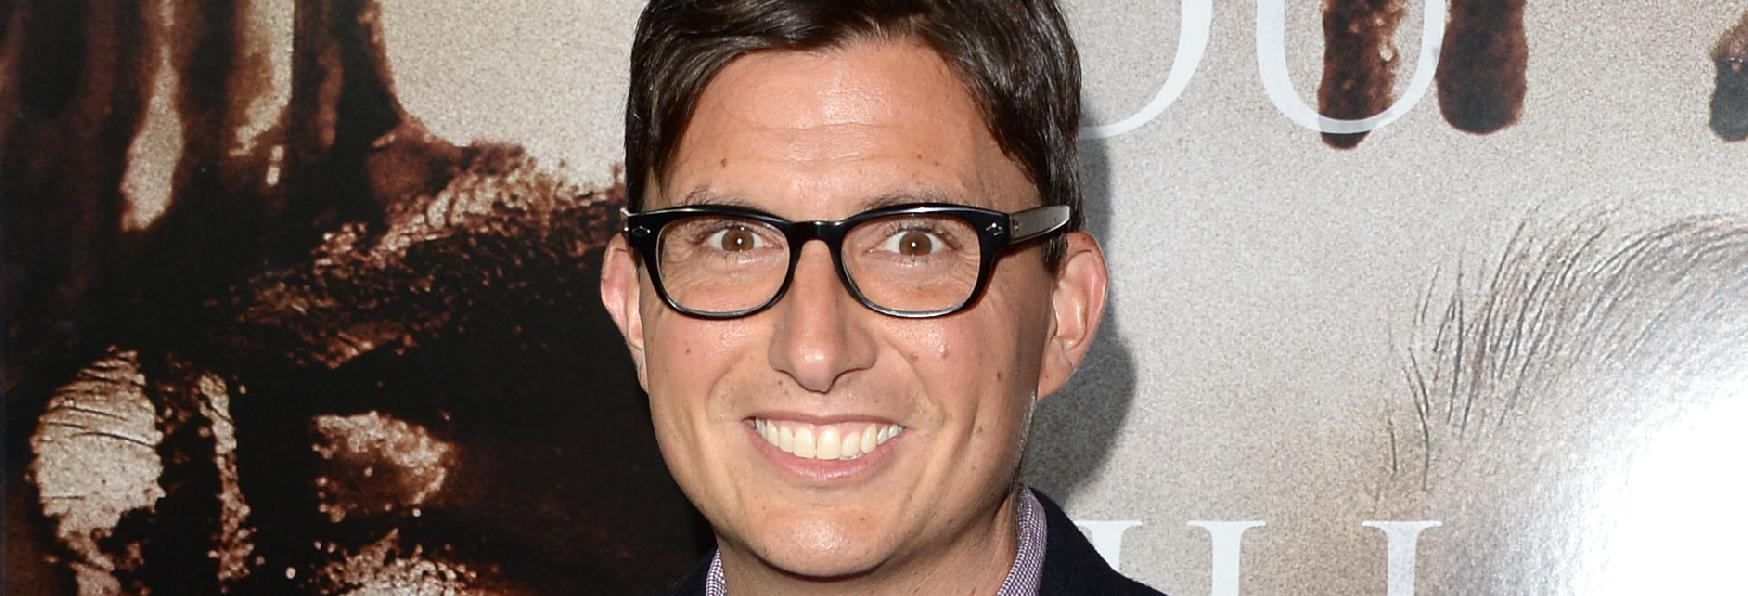 "Roberto Aguirre-Sacasa, Creatore di ""Riverdale"" firma un Contratto con Warner Bros. TV"